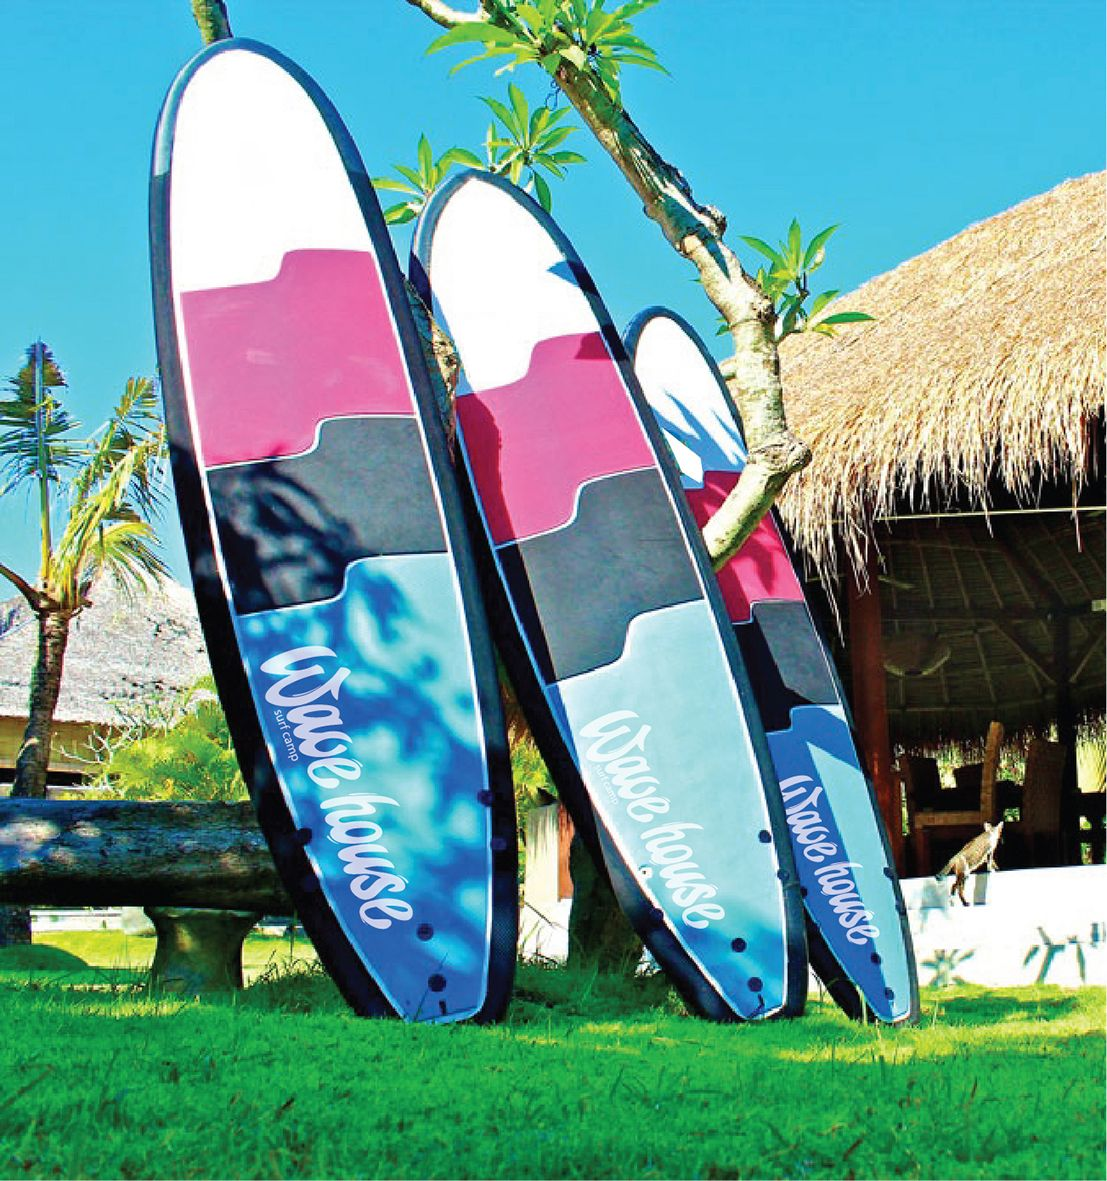 Редизайн логотипа для серф-кэмпа на Бали - дизайнер a-lenka85